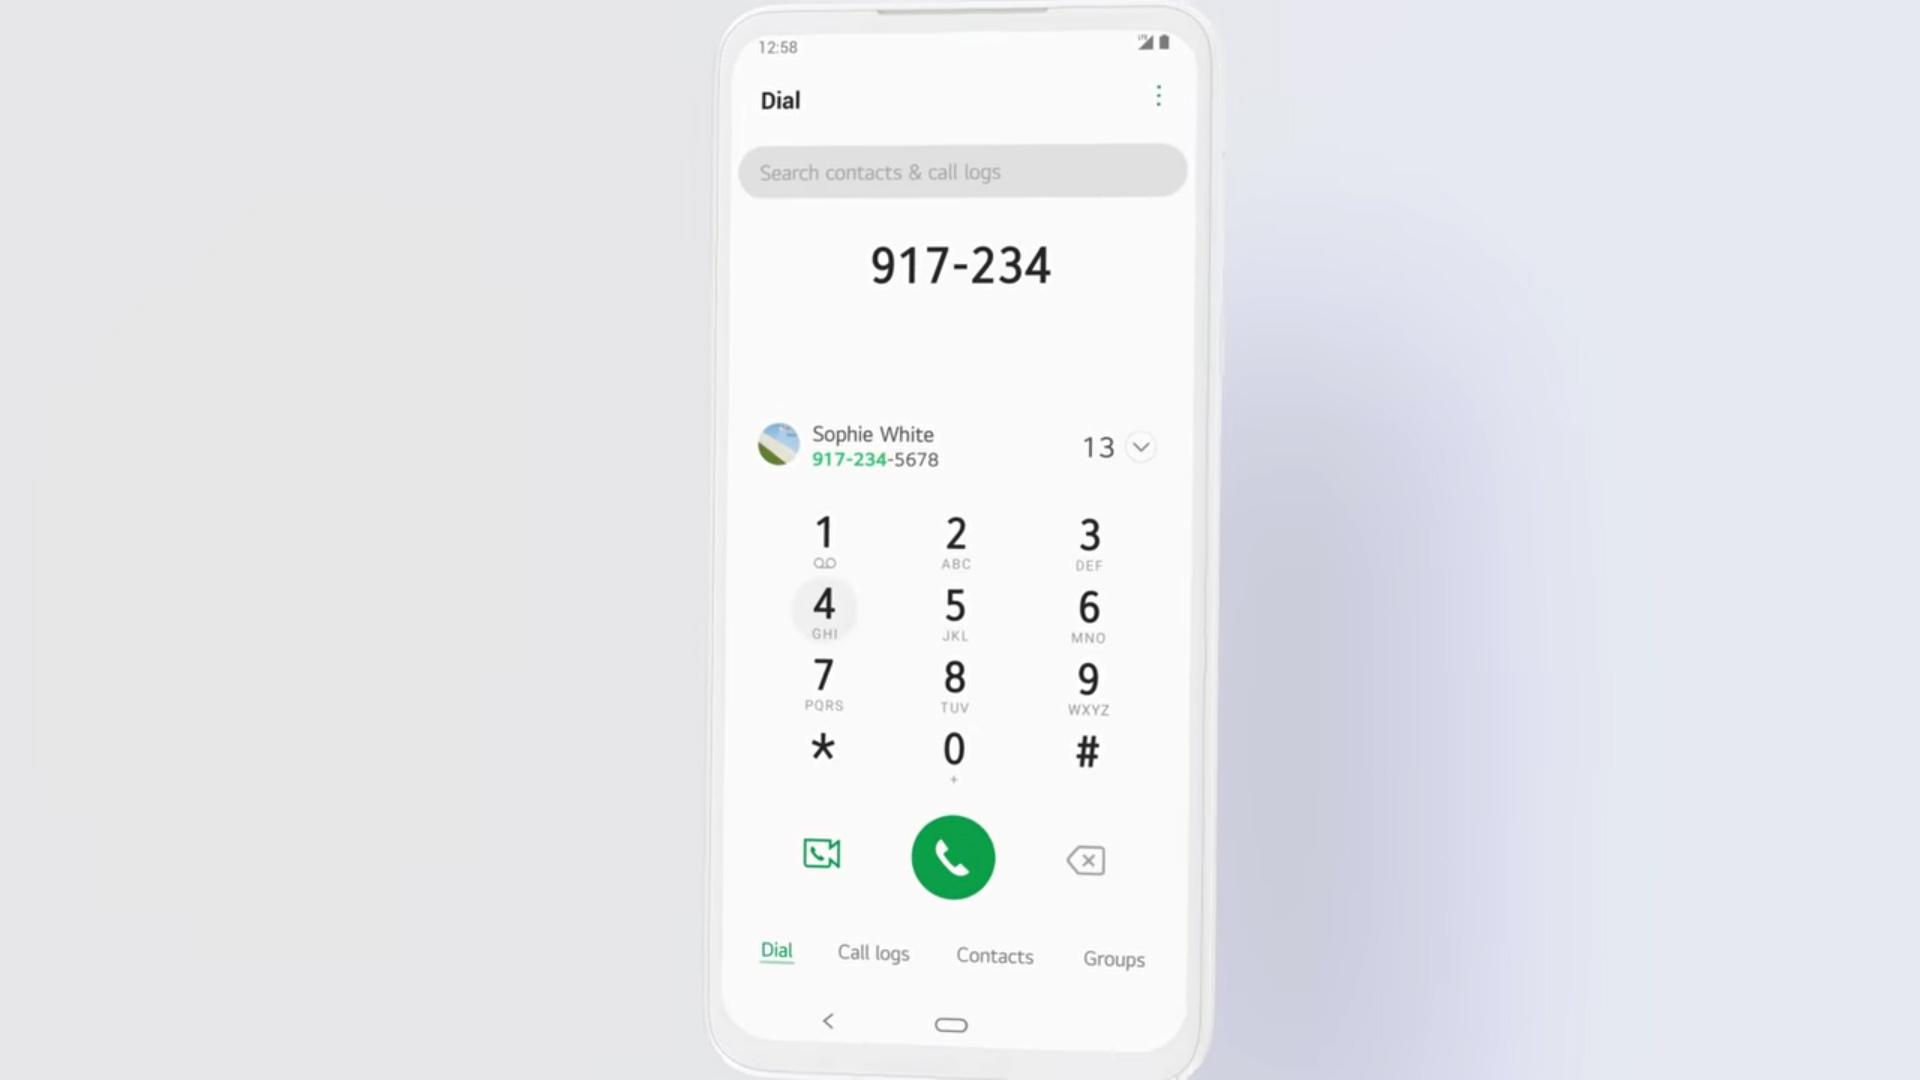 LG UX 9 Dialer app